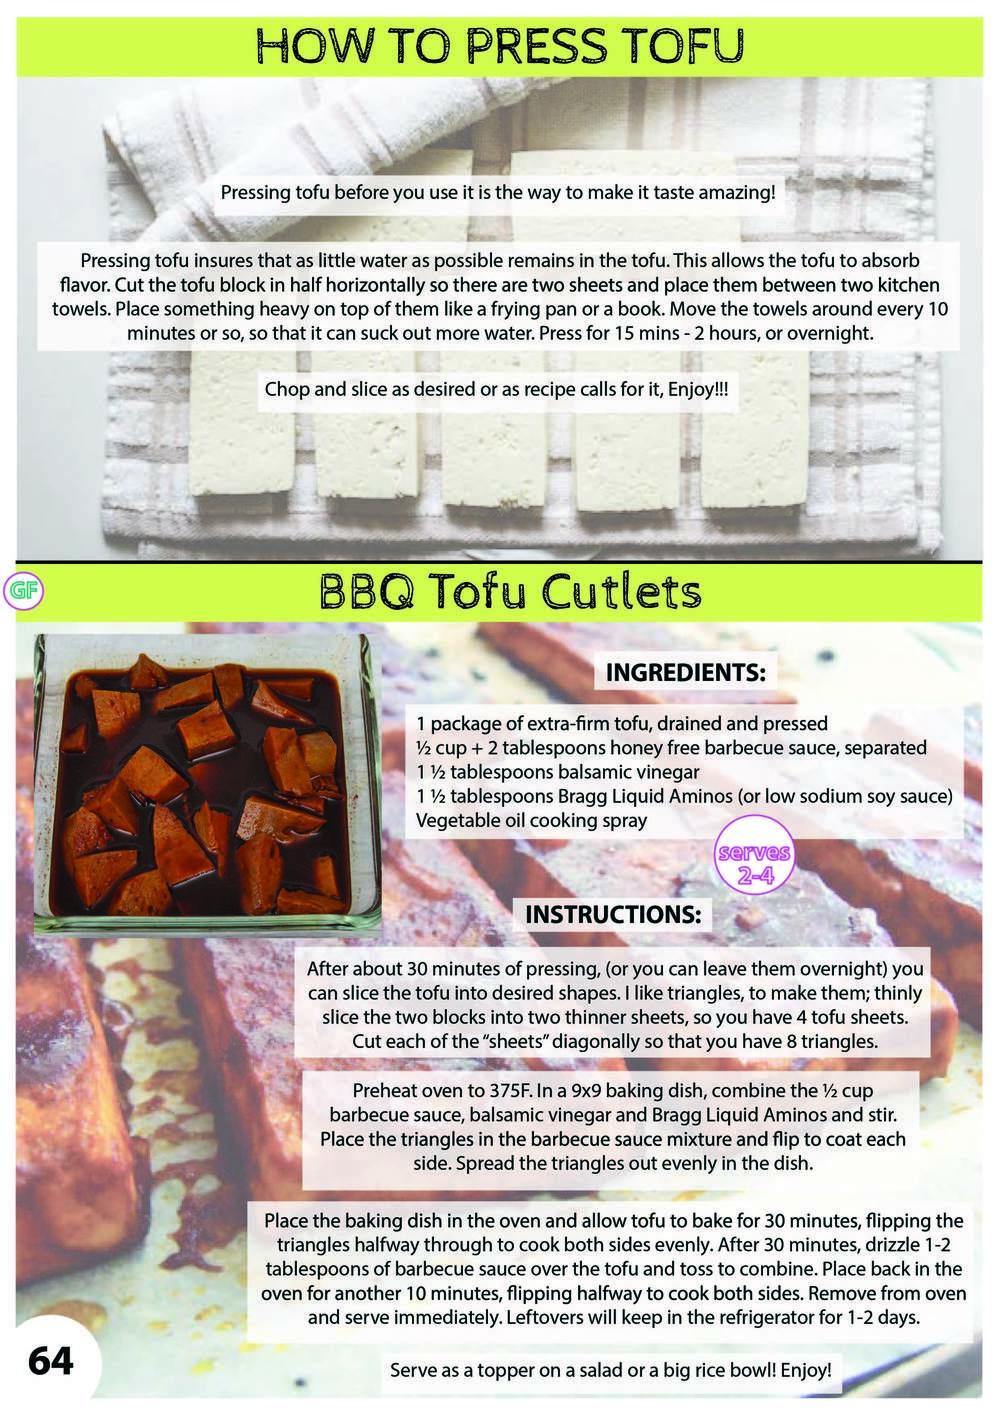 press tofu 64.jpg